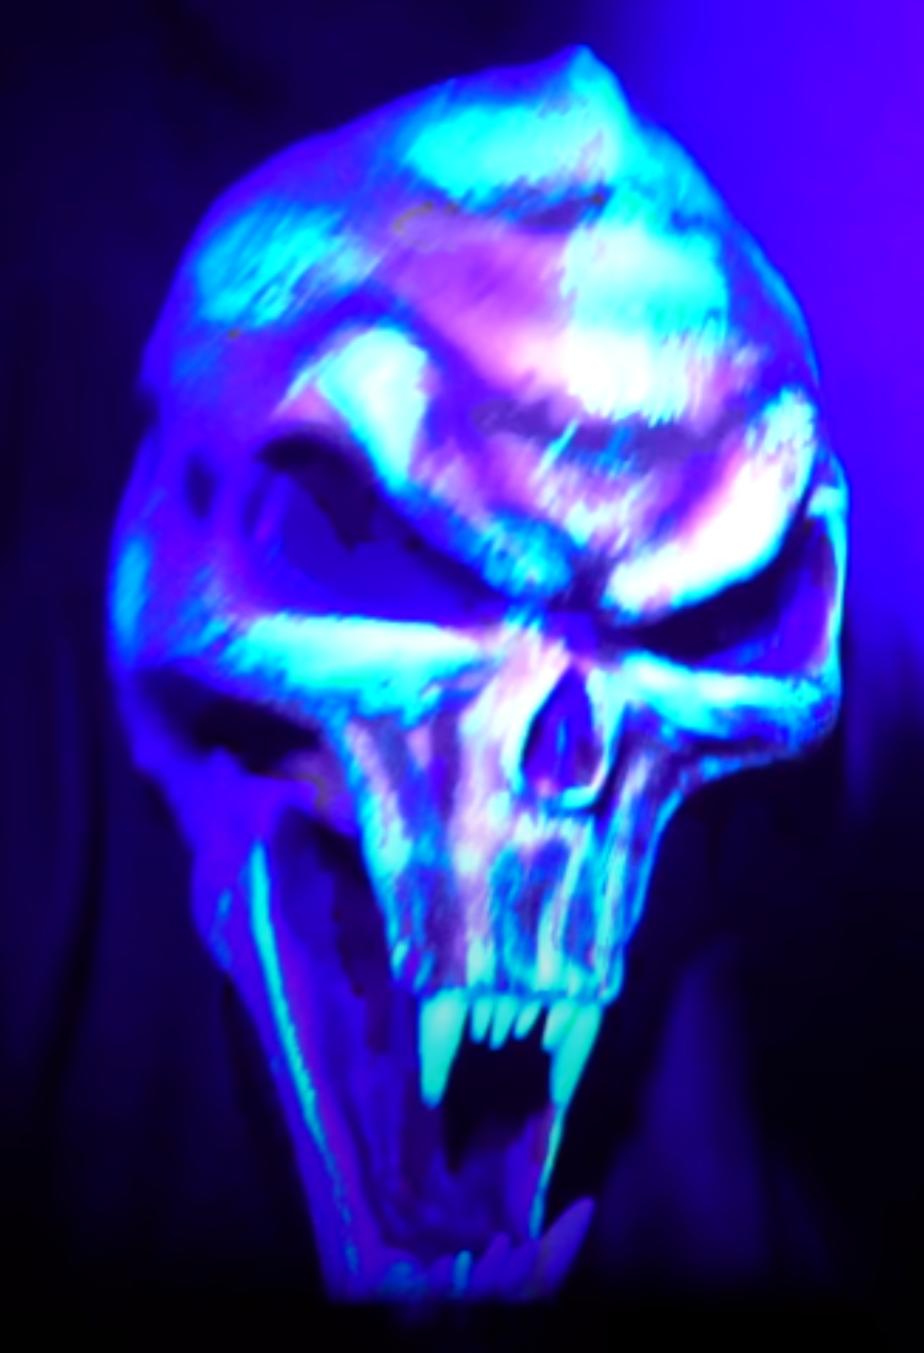 Dark Skull Head Poltergeists